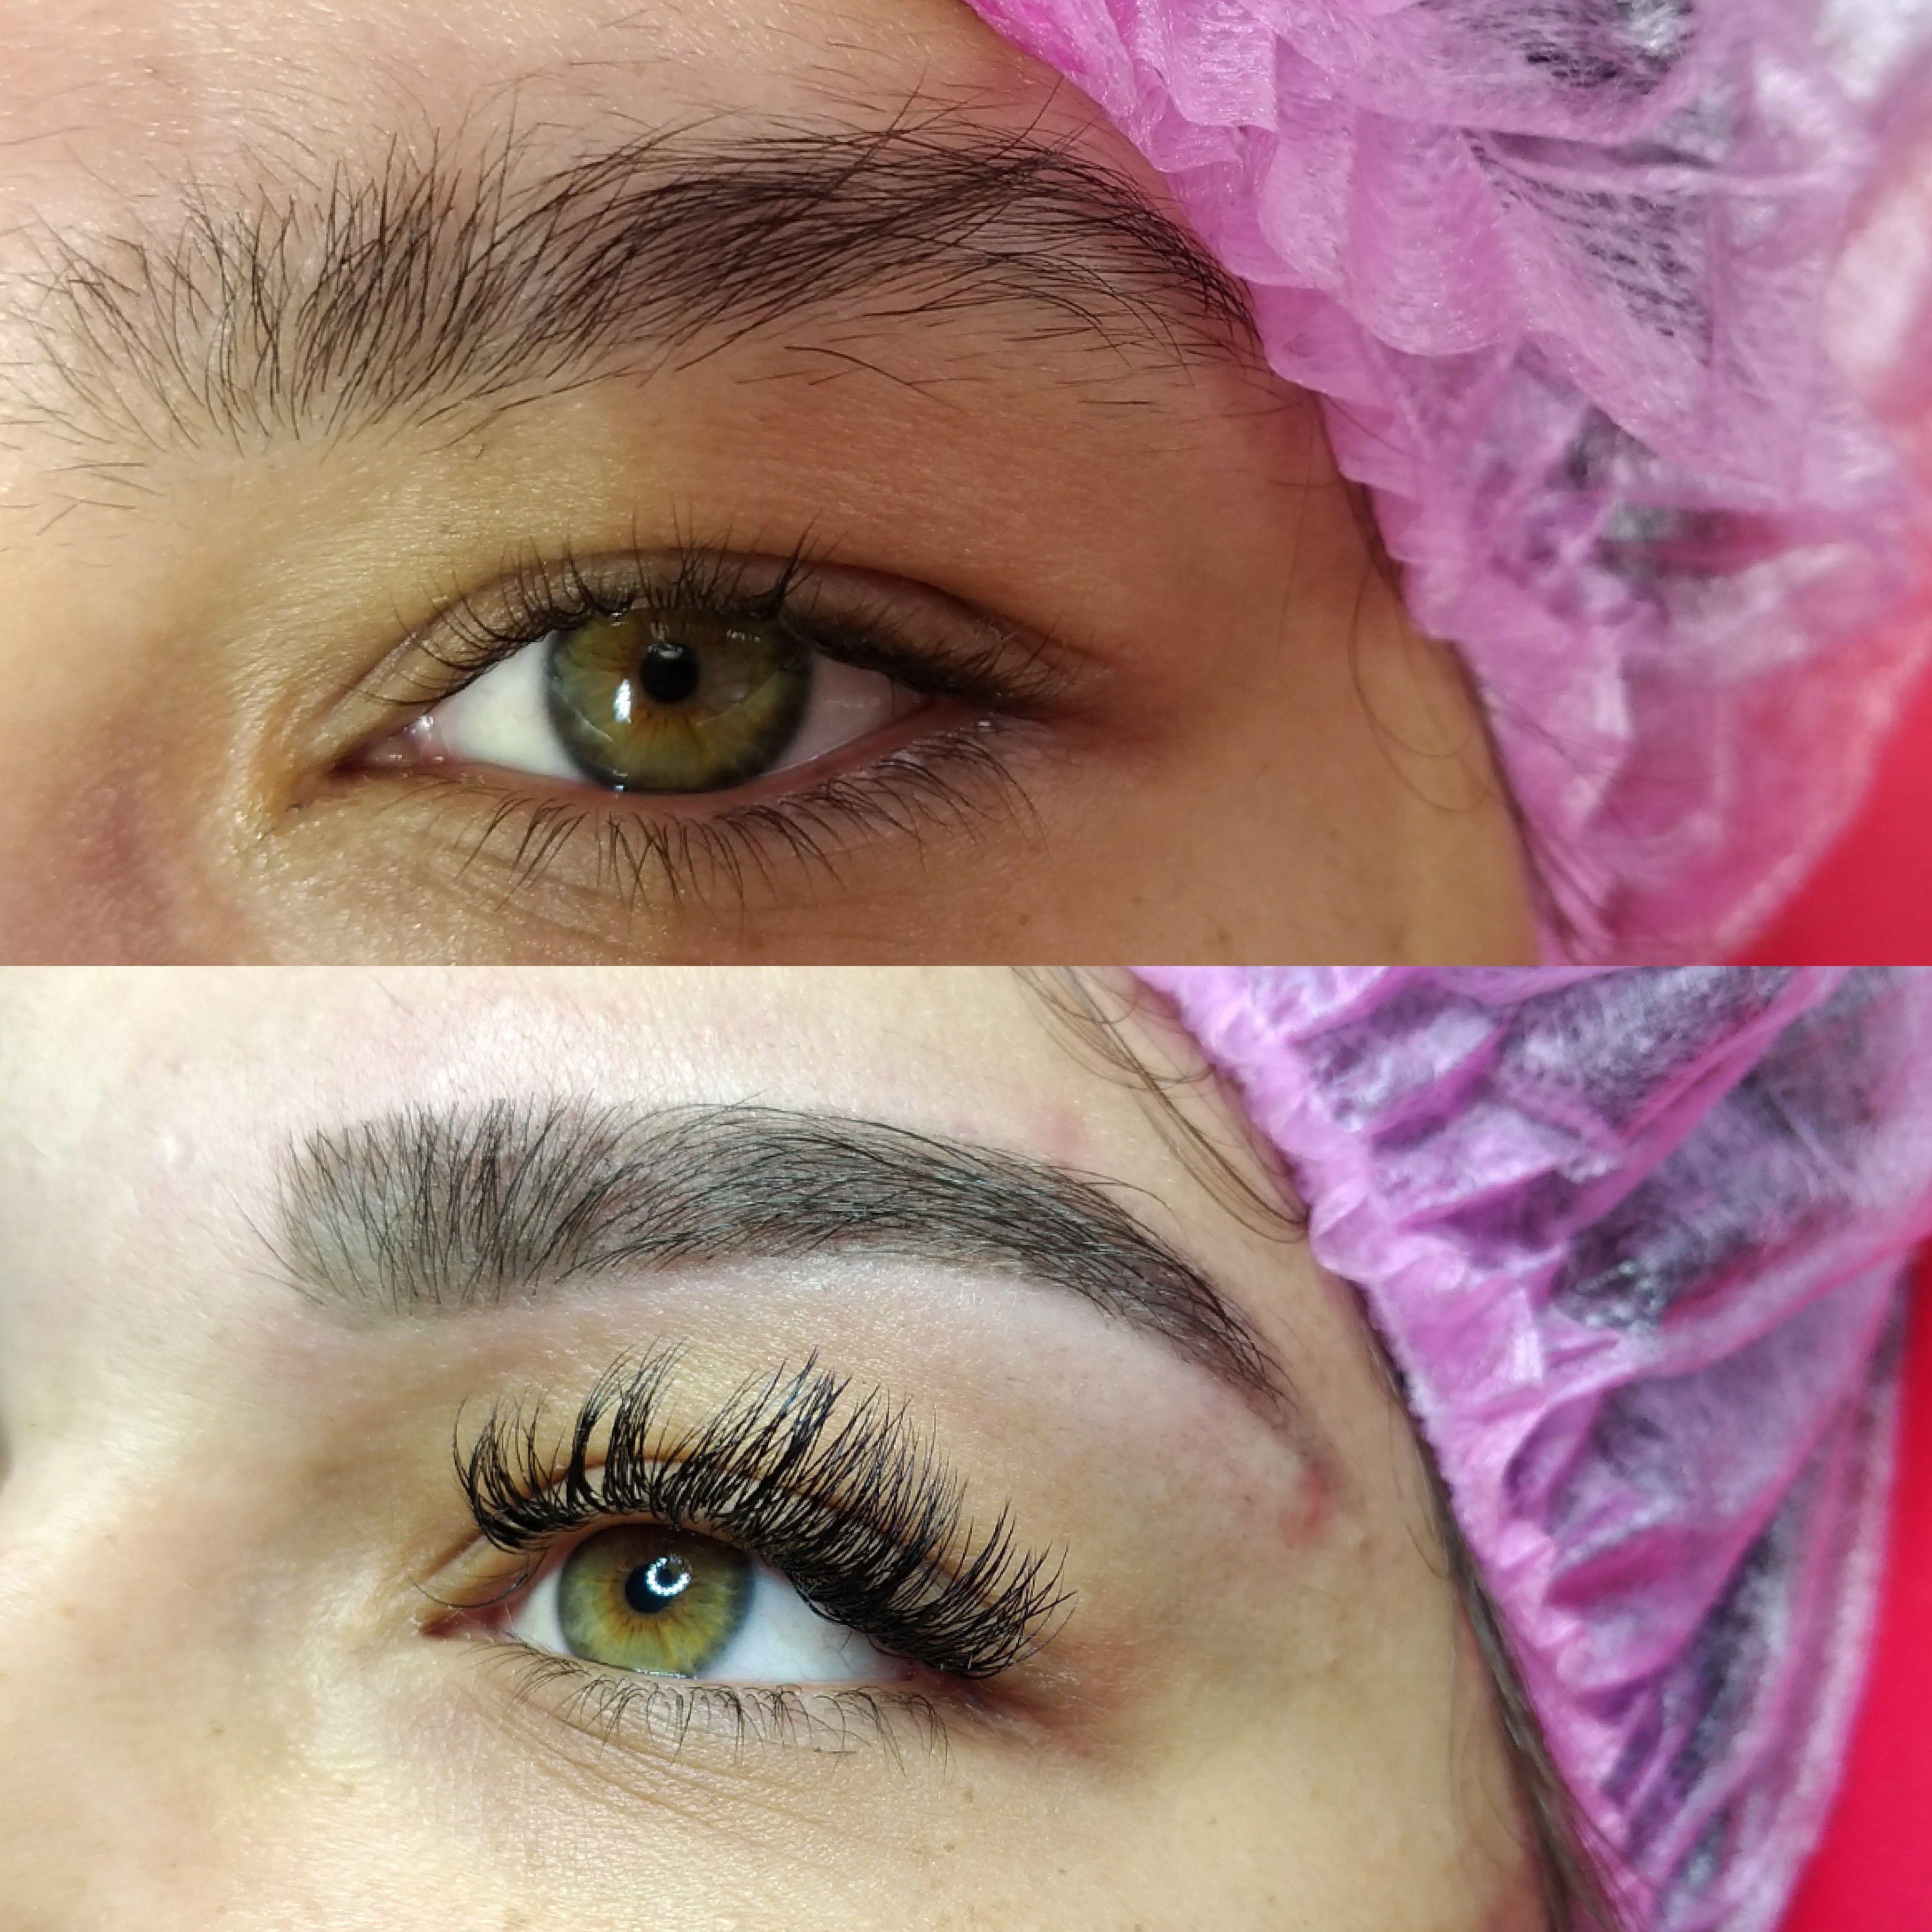 Design de sobrancelhas e alongamento de cílios fio a fio. estética esteticista designer de sobrancelhas micropigmentador(a) dermopigmentador(a) outros